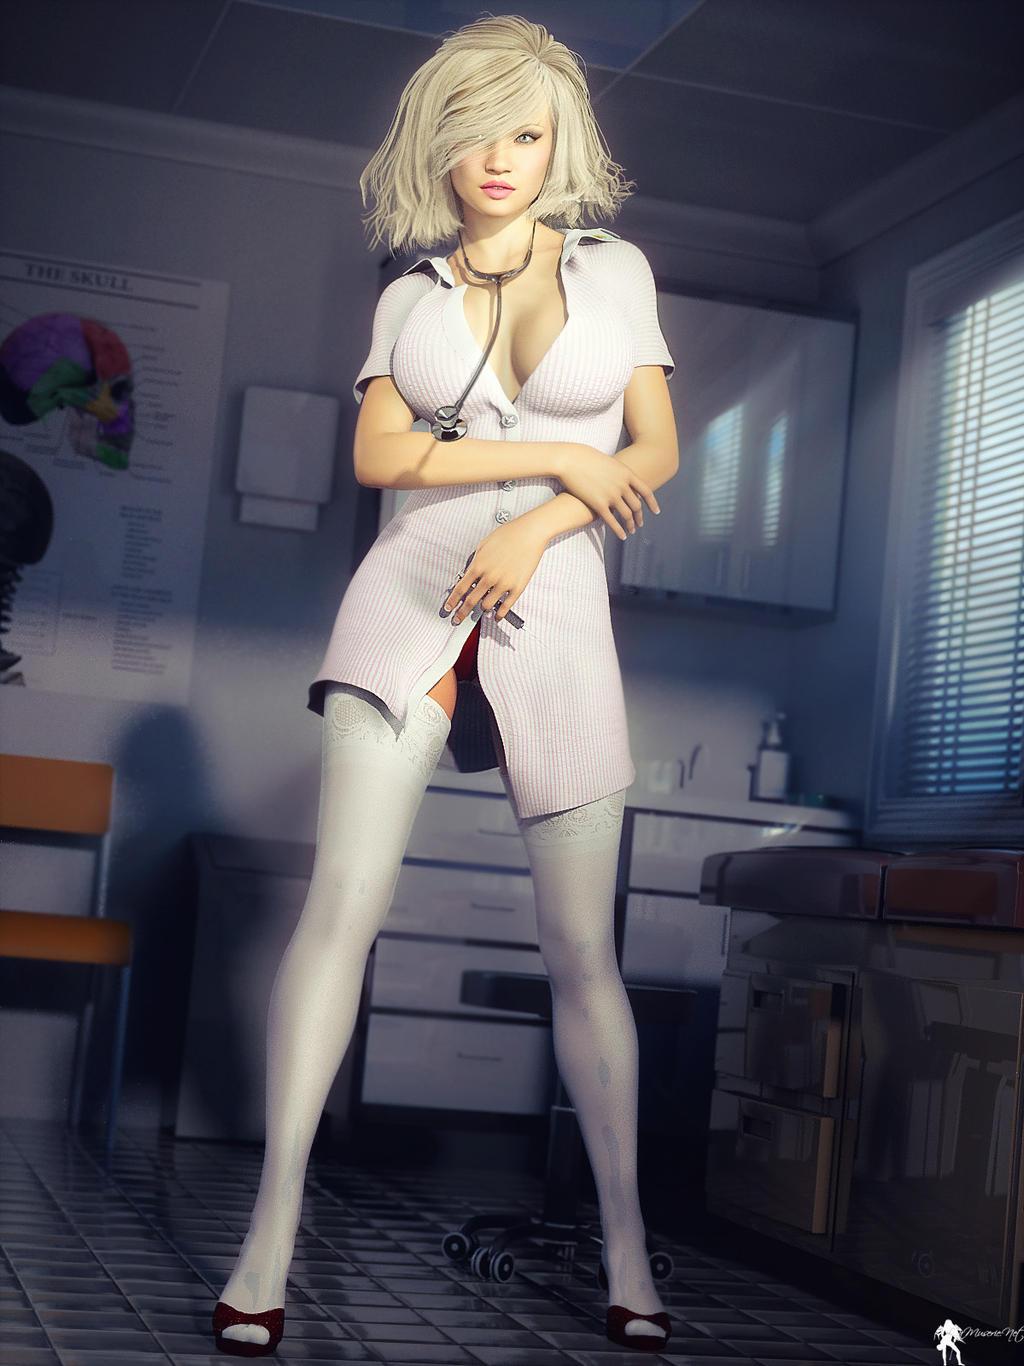 Nurse 1 by LaMuserie